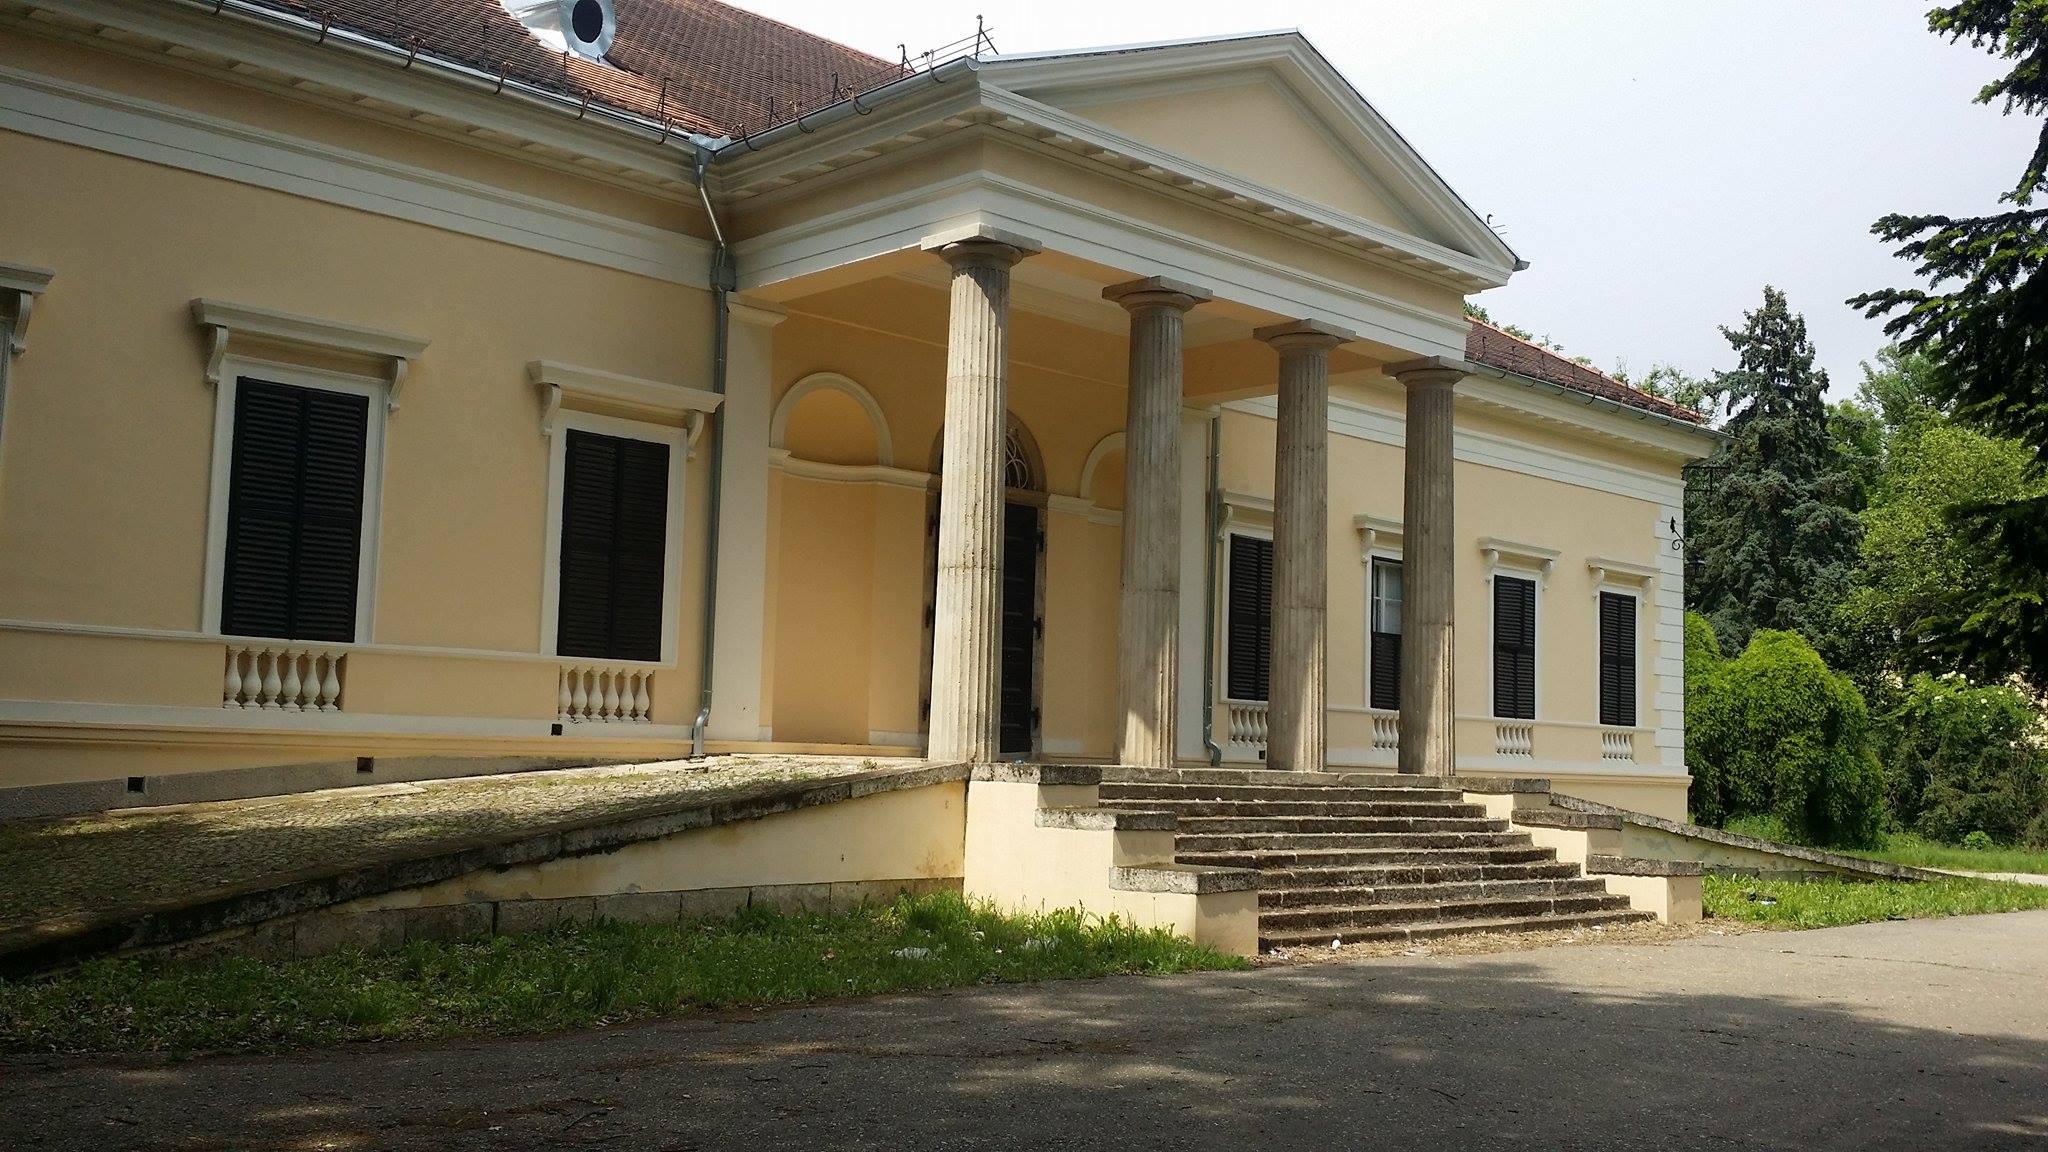 Čelarevo – Dvorac prohujalih vremena